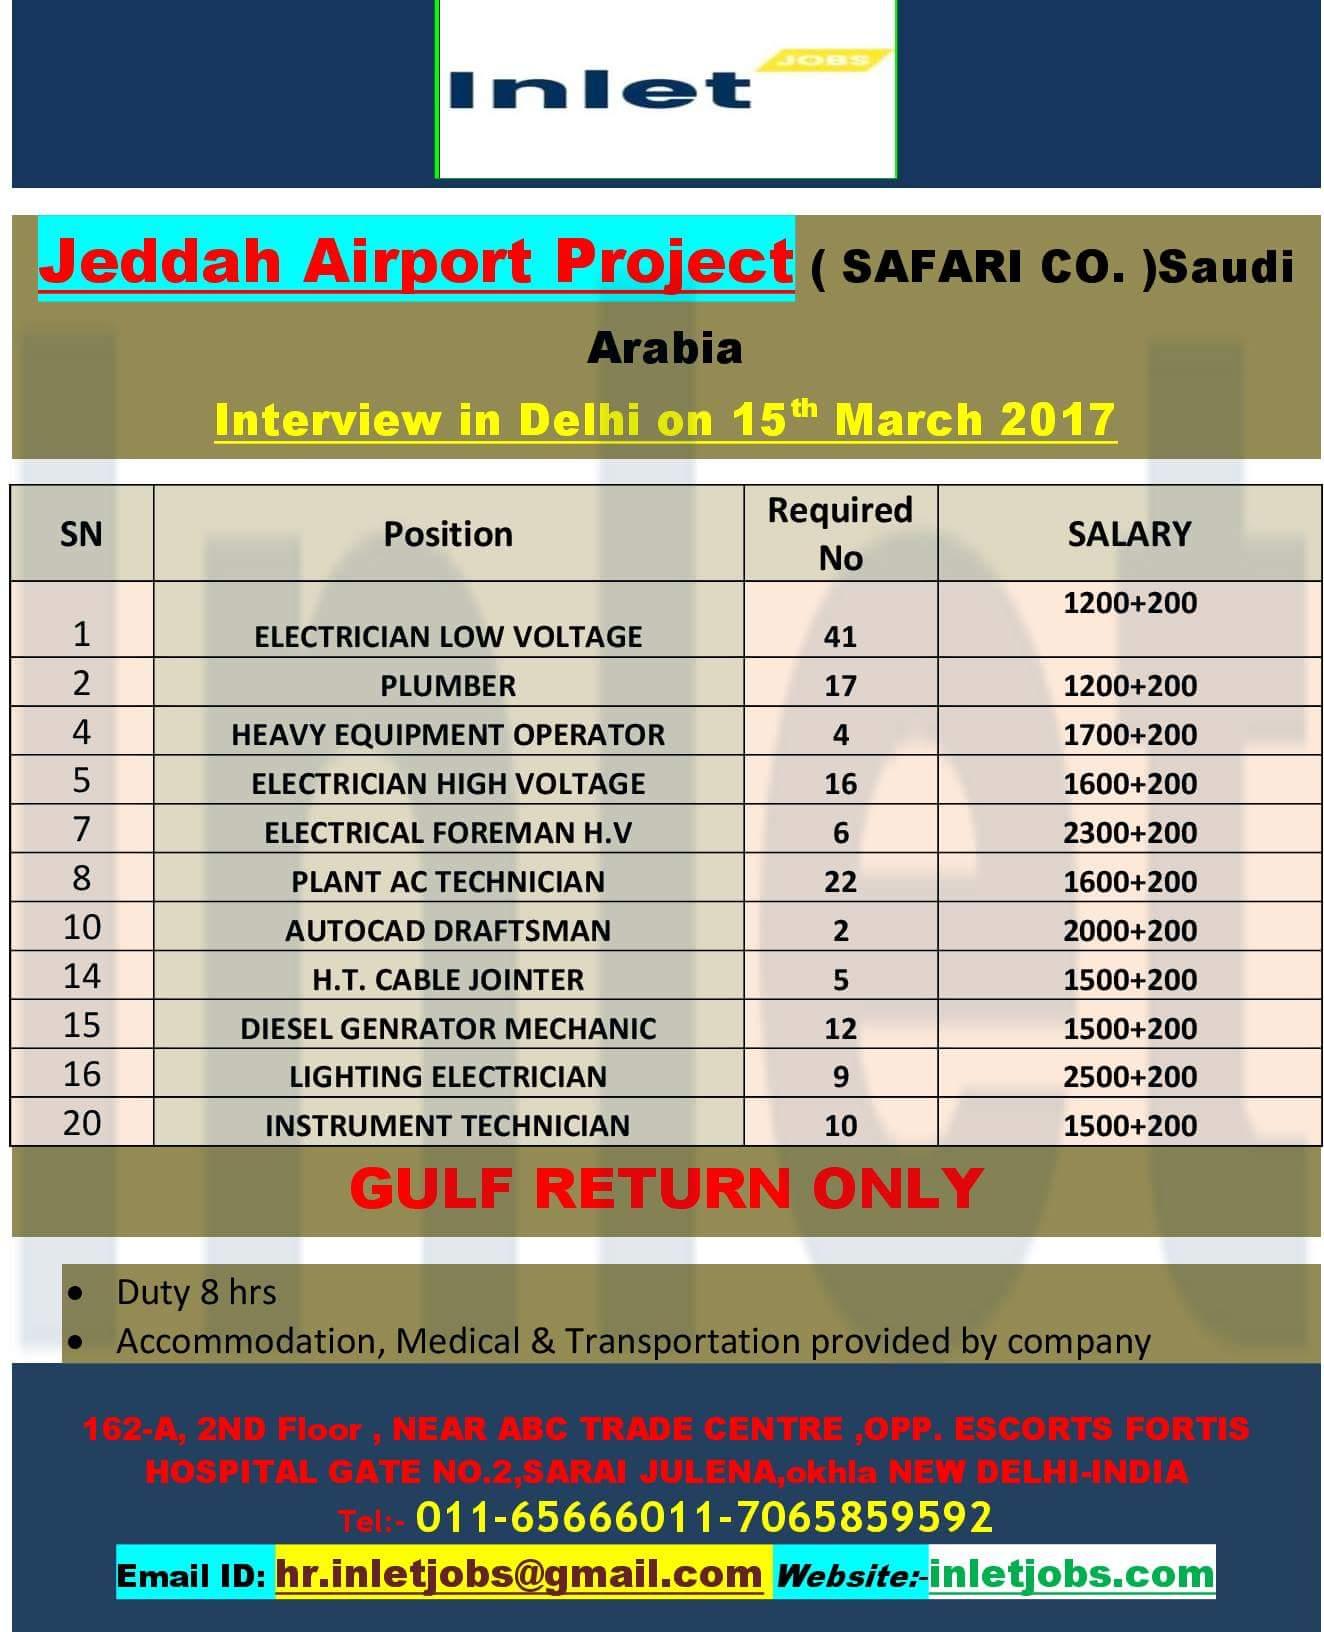 AIRPORT JOB VACANCIES IN SAUDI ARABIA - JOBS AT GULF